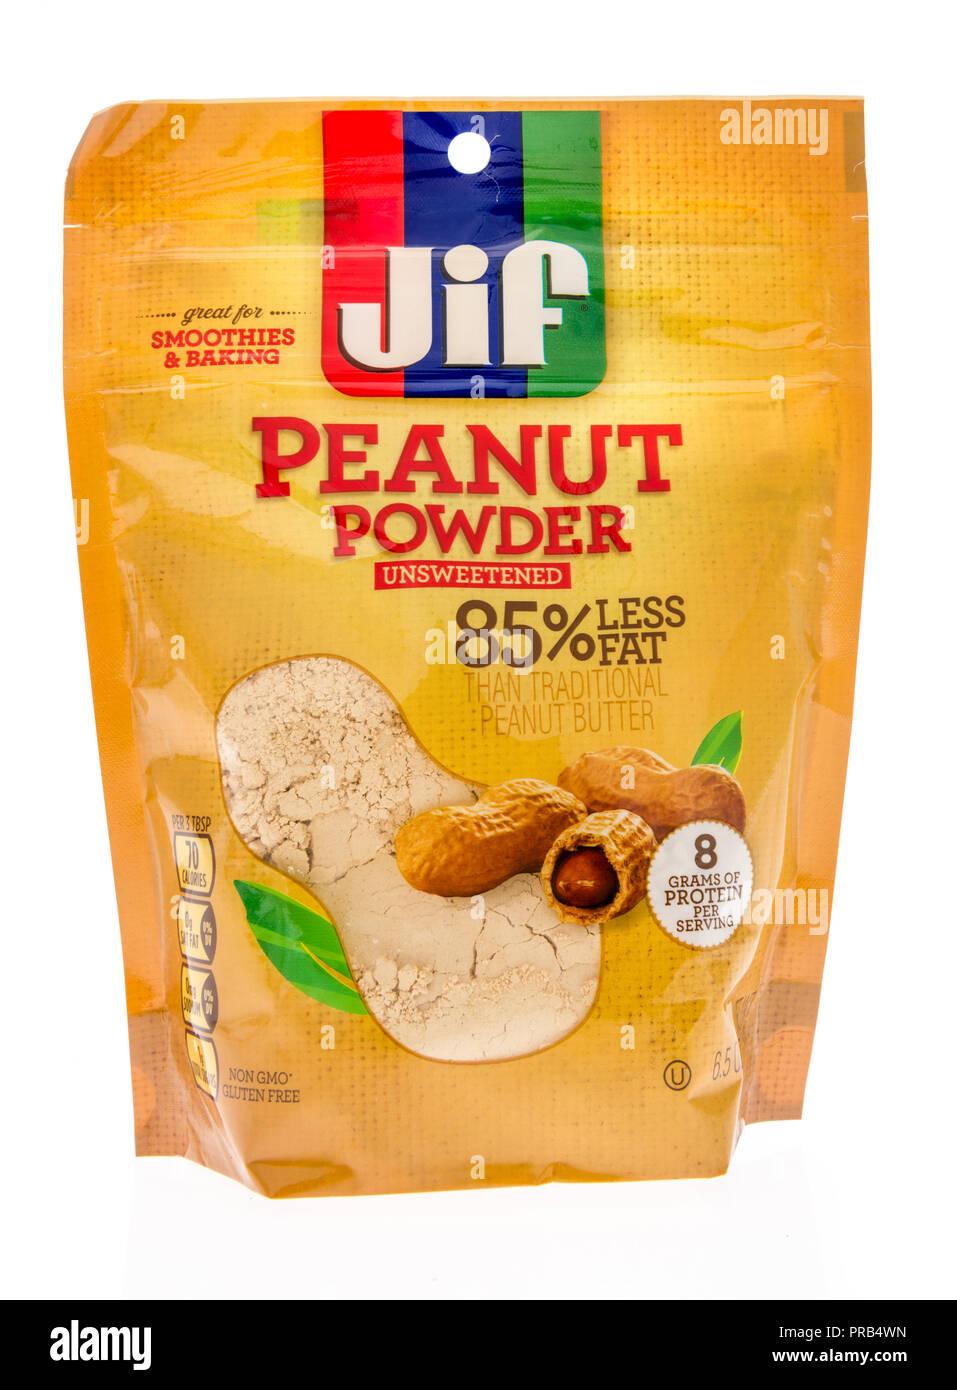 A Bag Of Baking Powder Stock Photos & A Bag Of Baking Powder